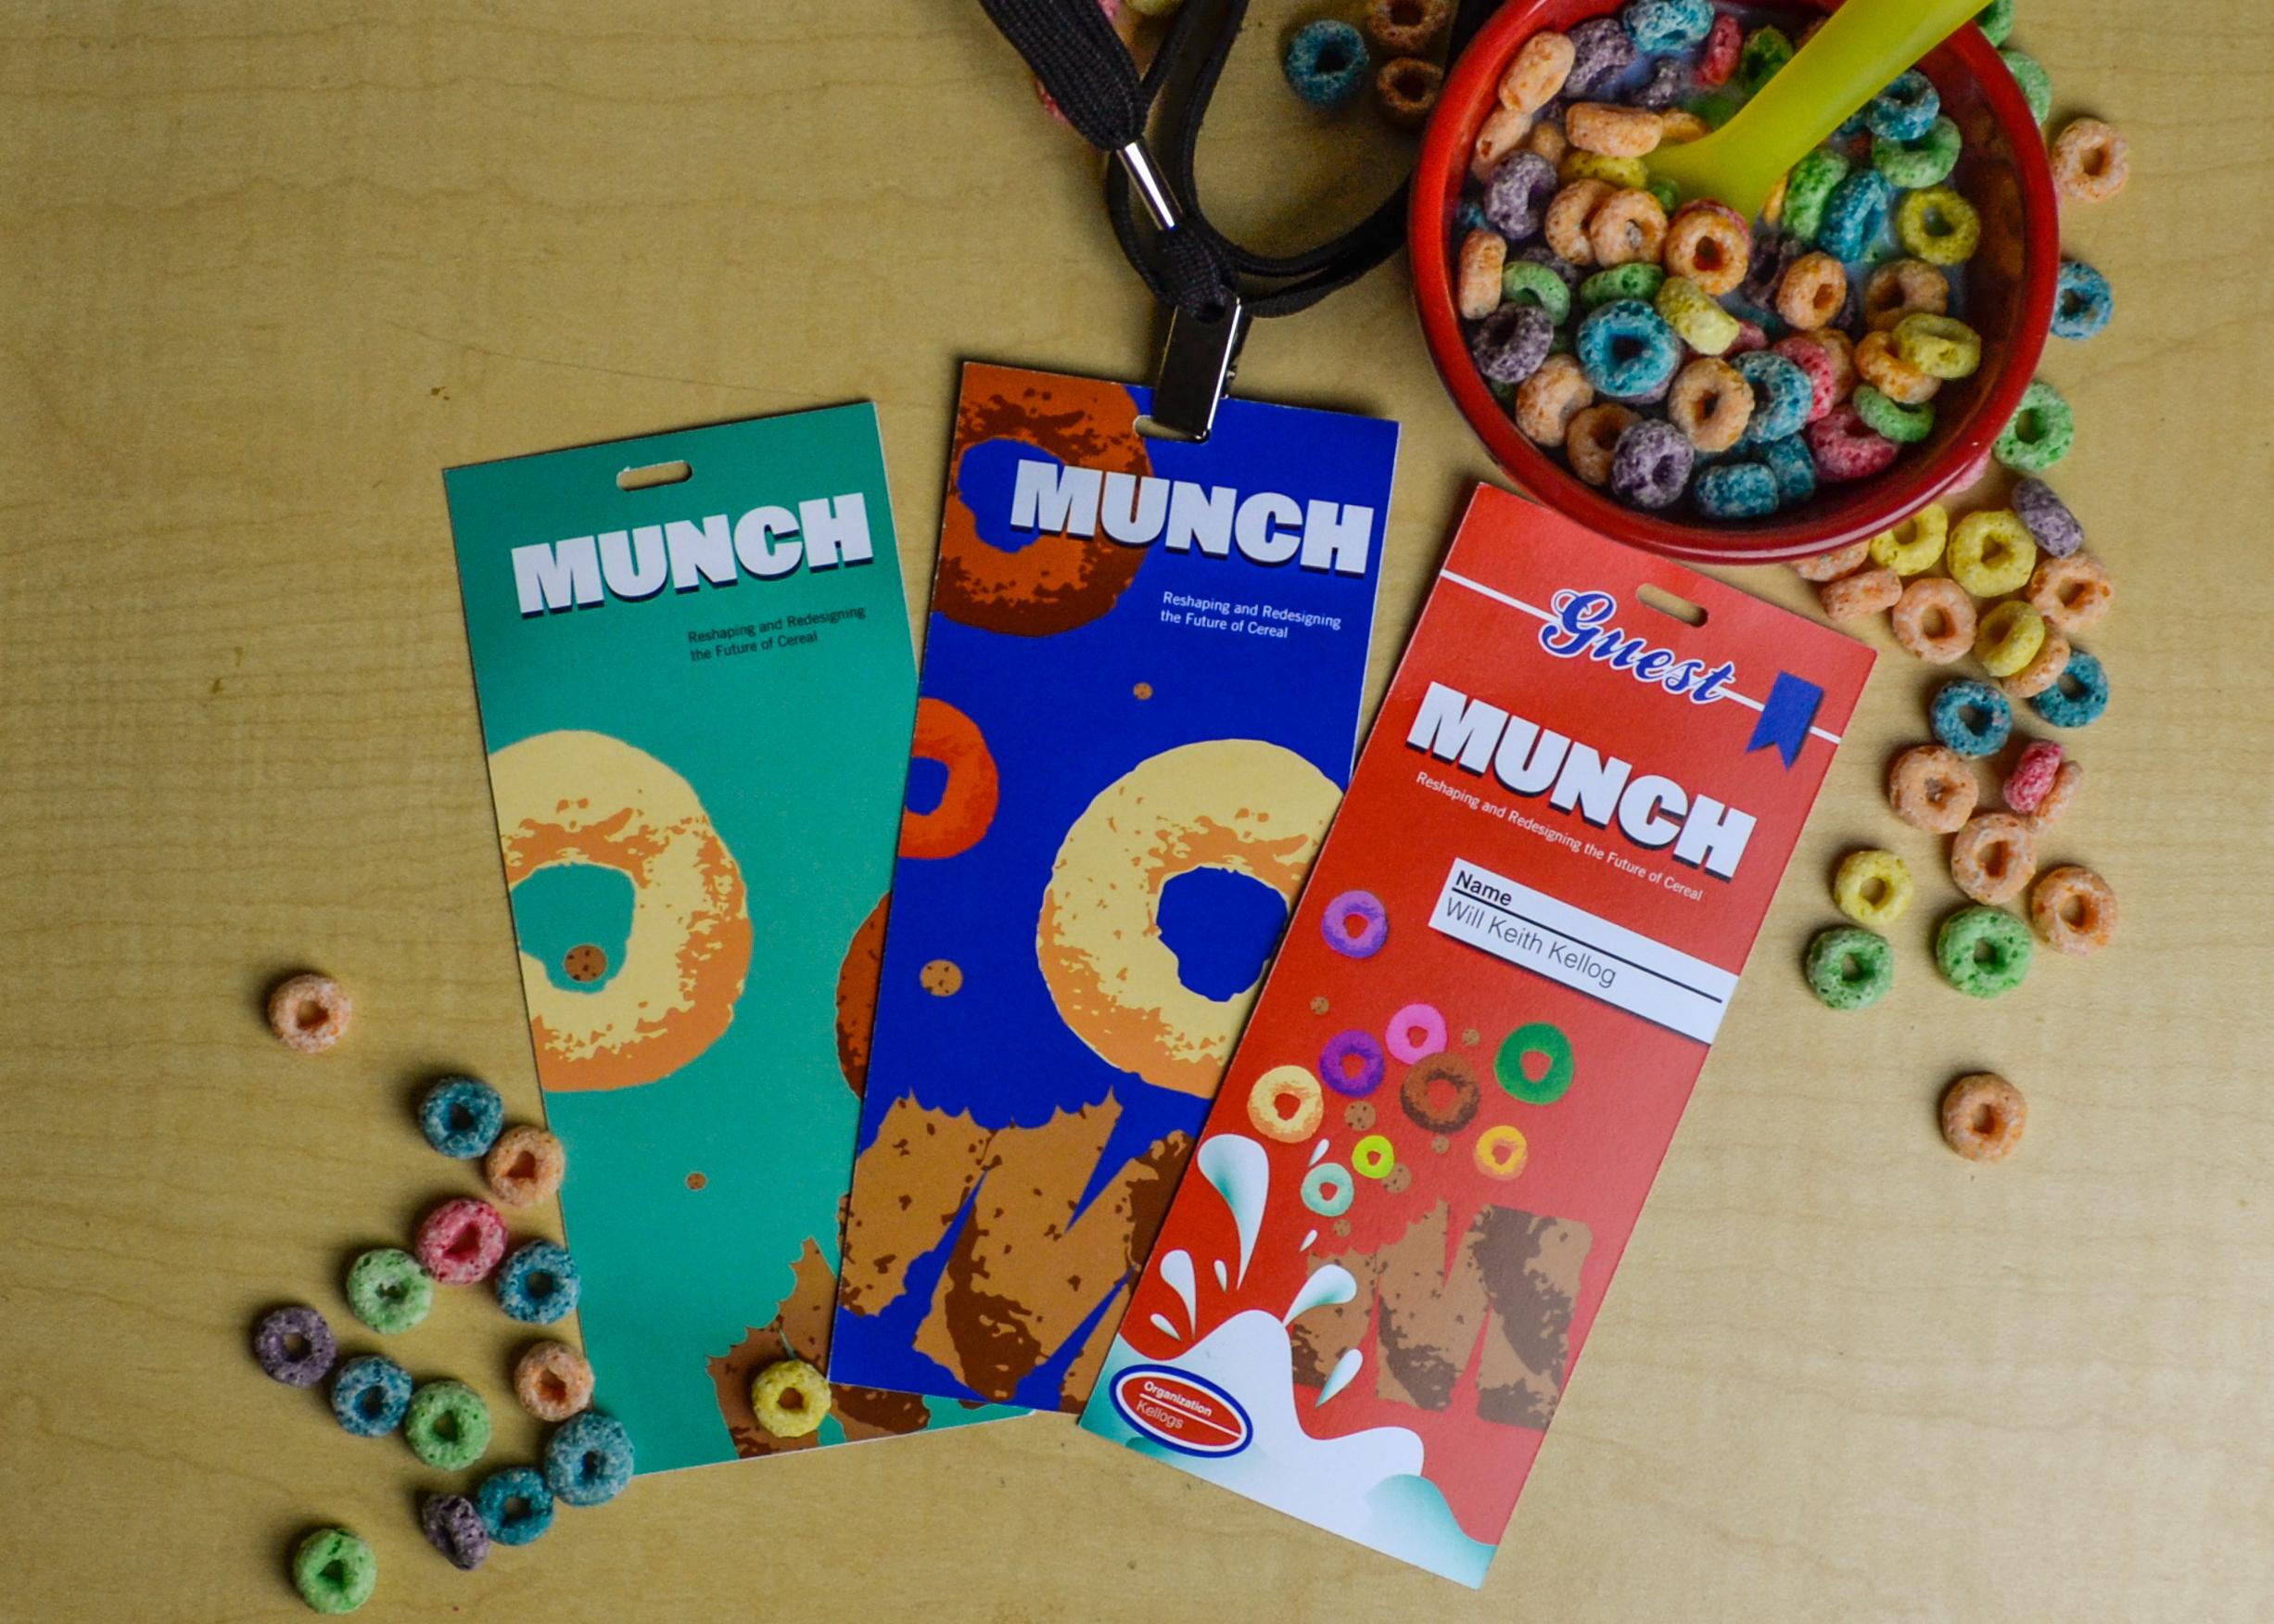 Munch Name Badges